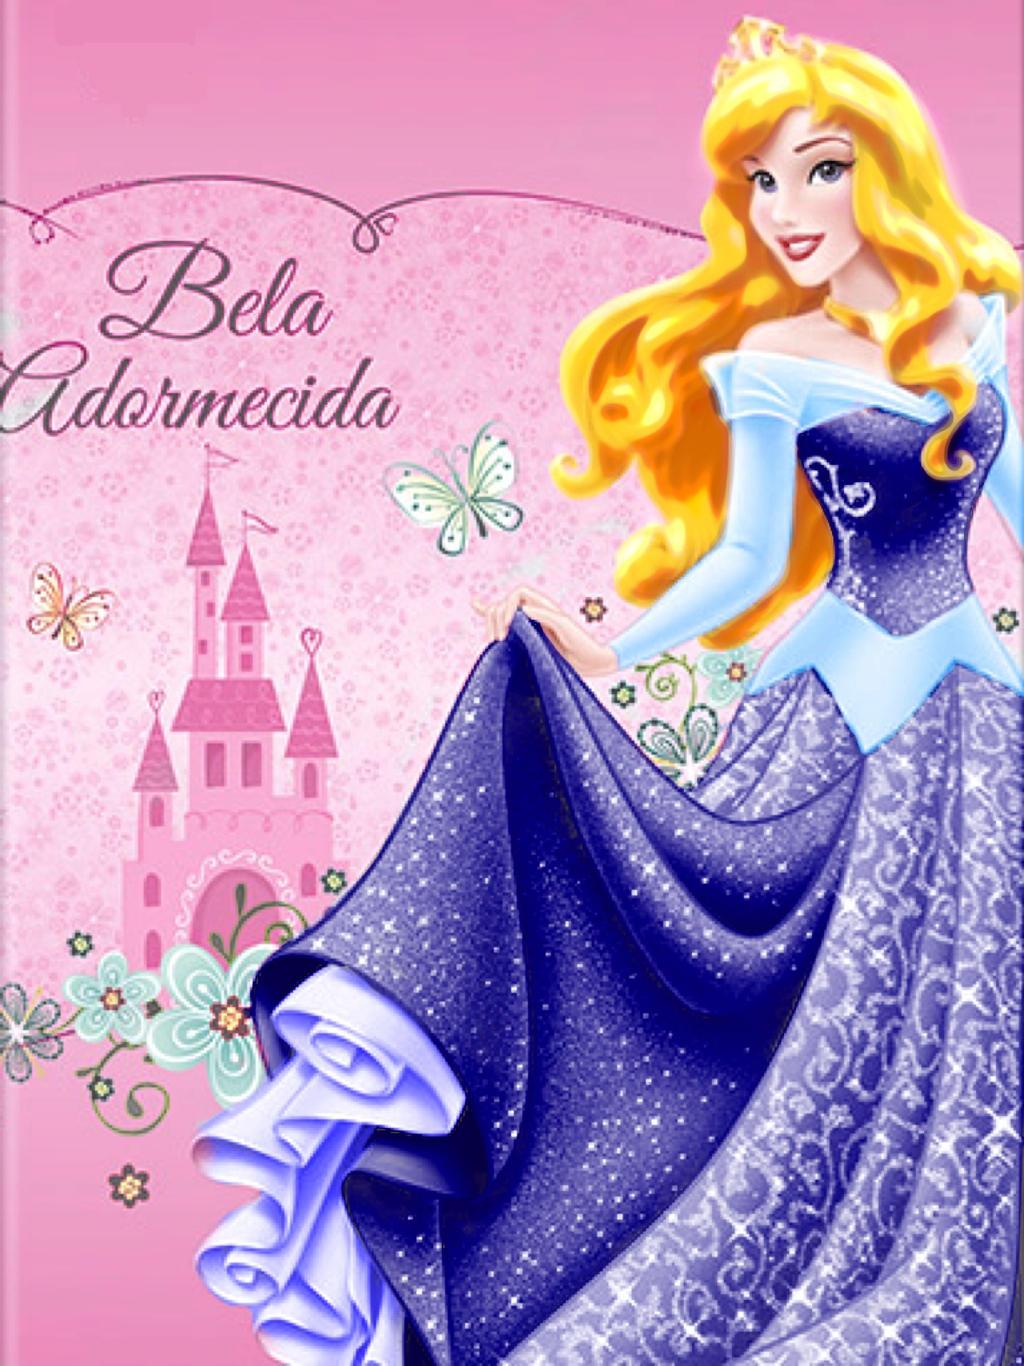 LittleMissTardis11 Princess Aurora Sleeping Beauty New Look In Blue By